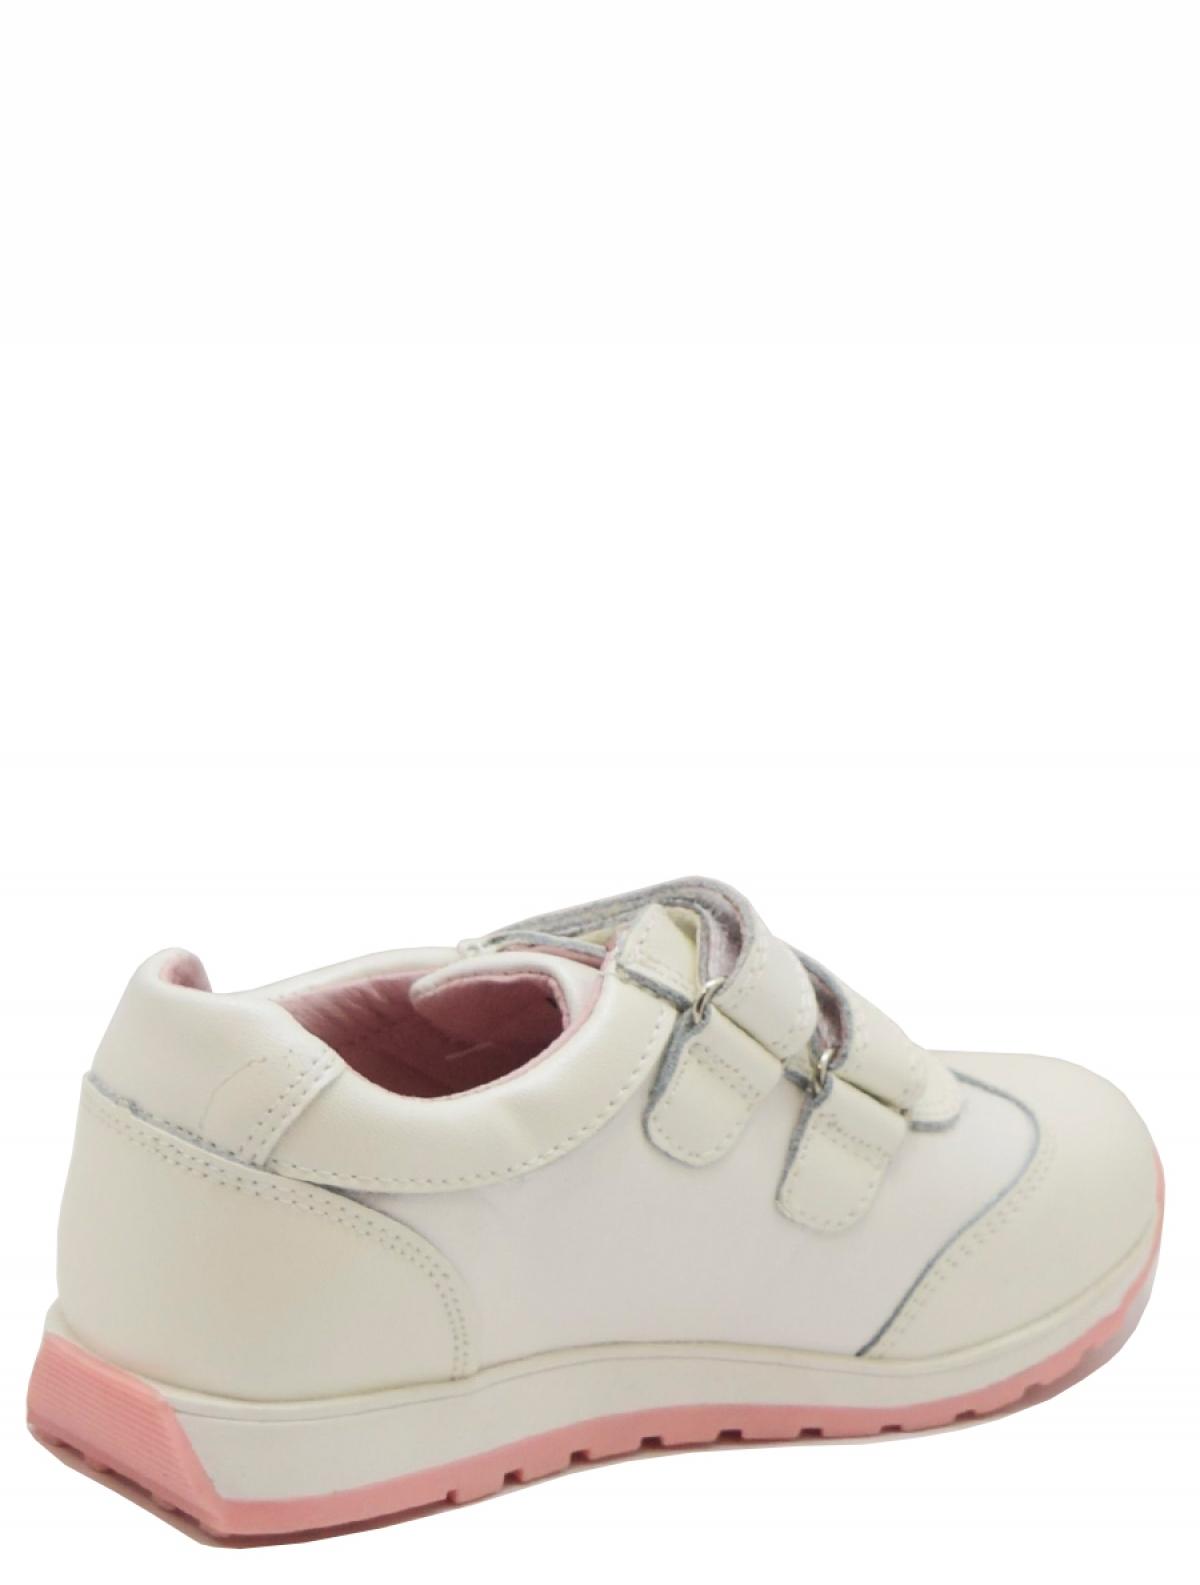 A-B80-37-B  кросcовки для девочки